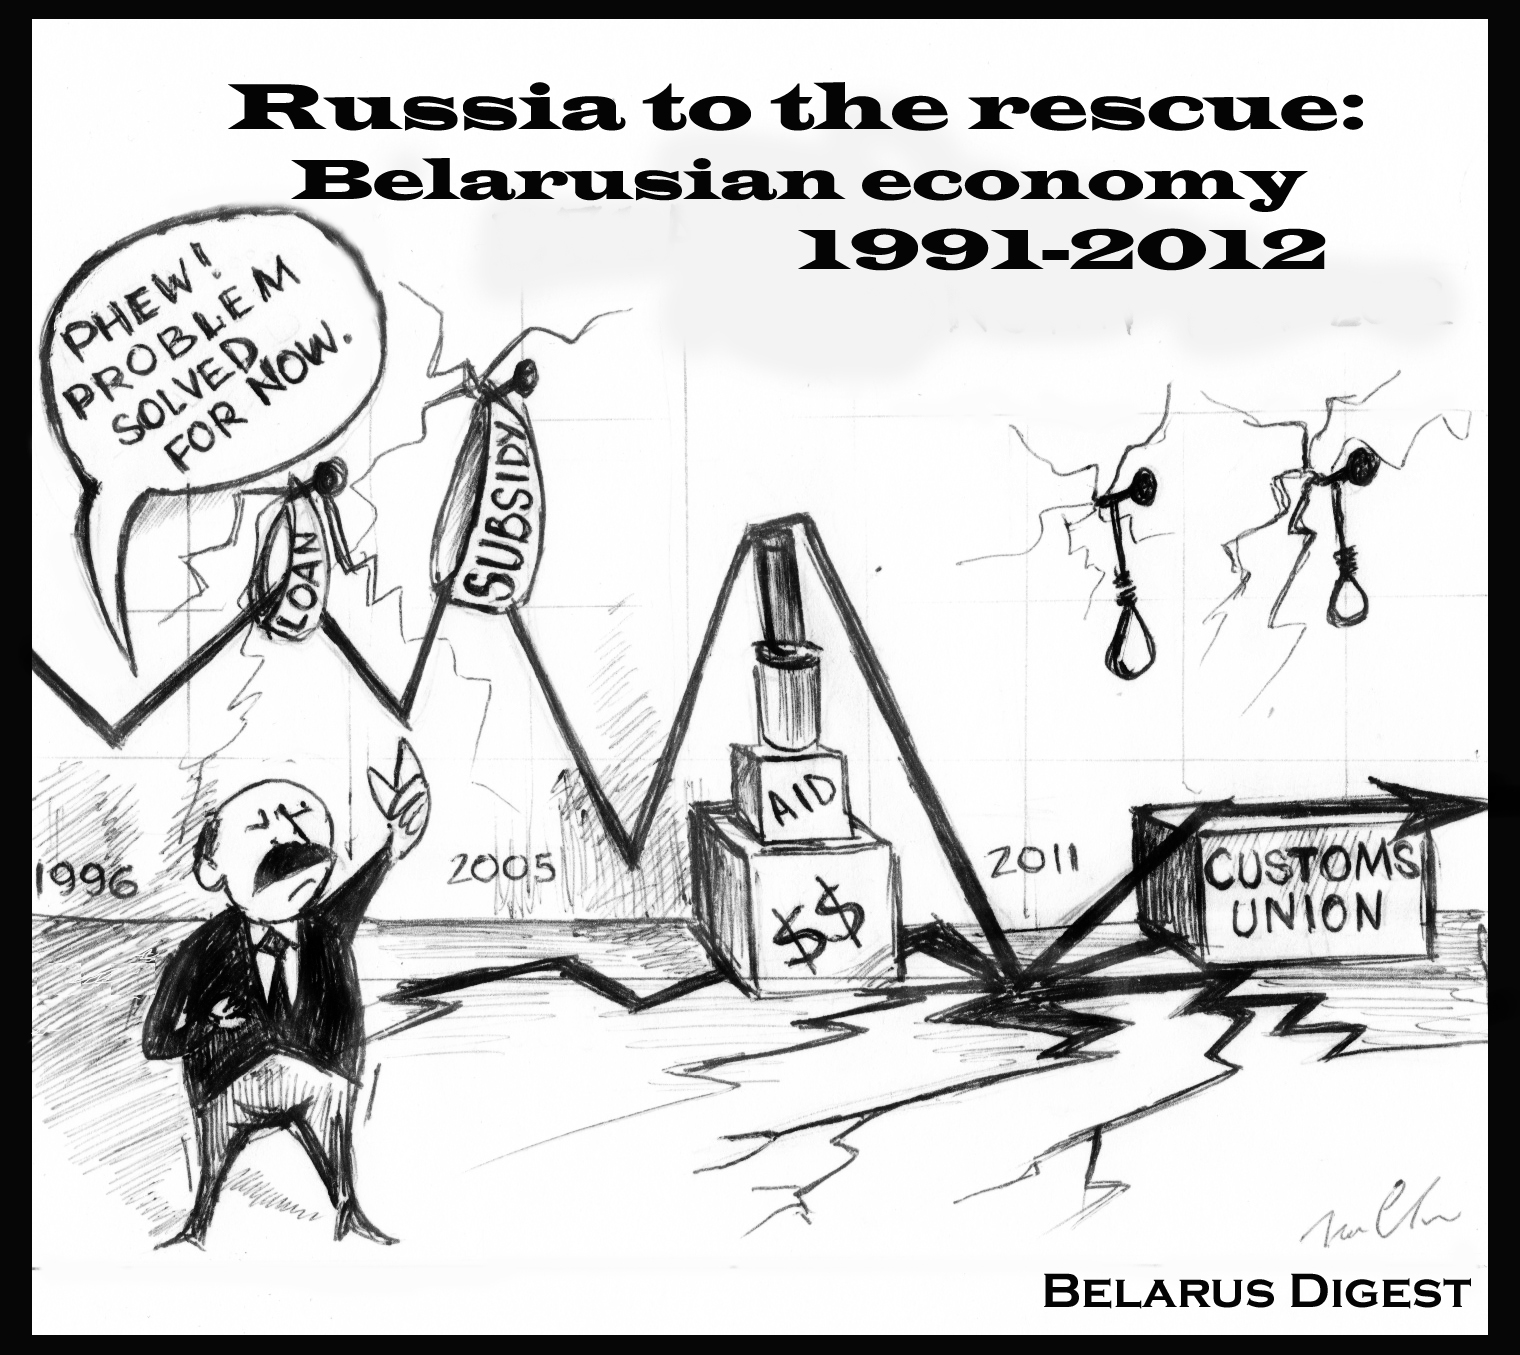 belarusian_economy.jpg